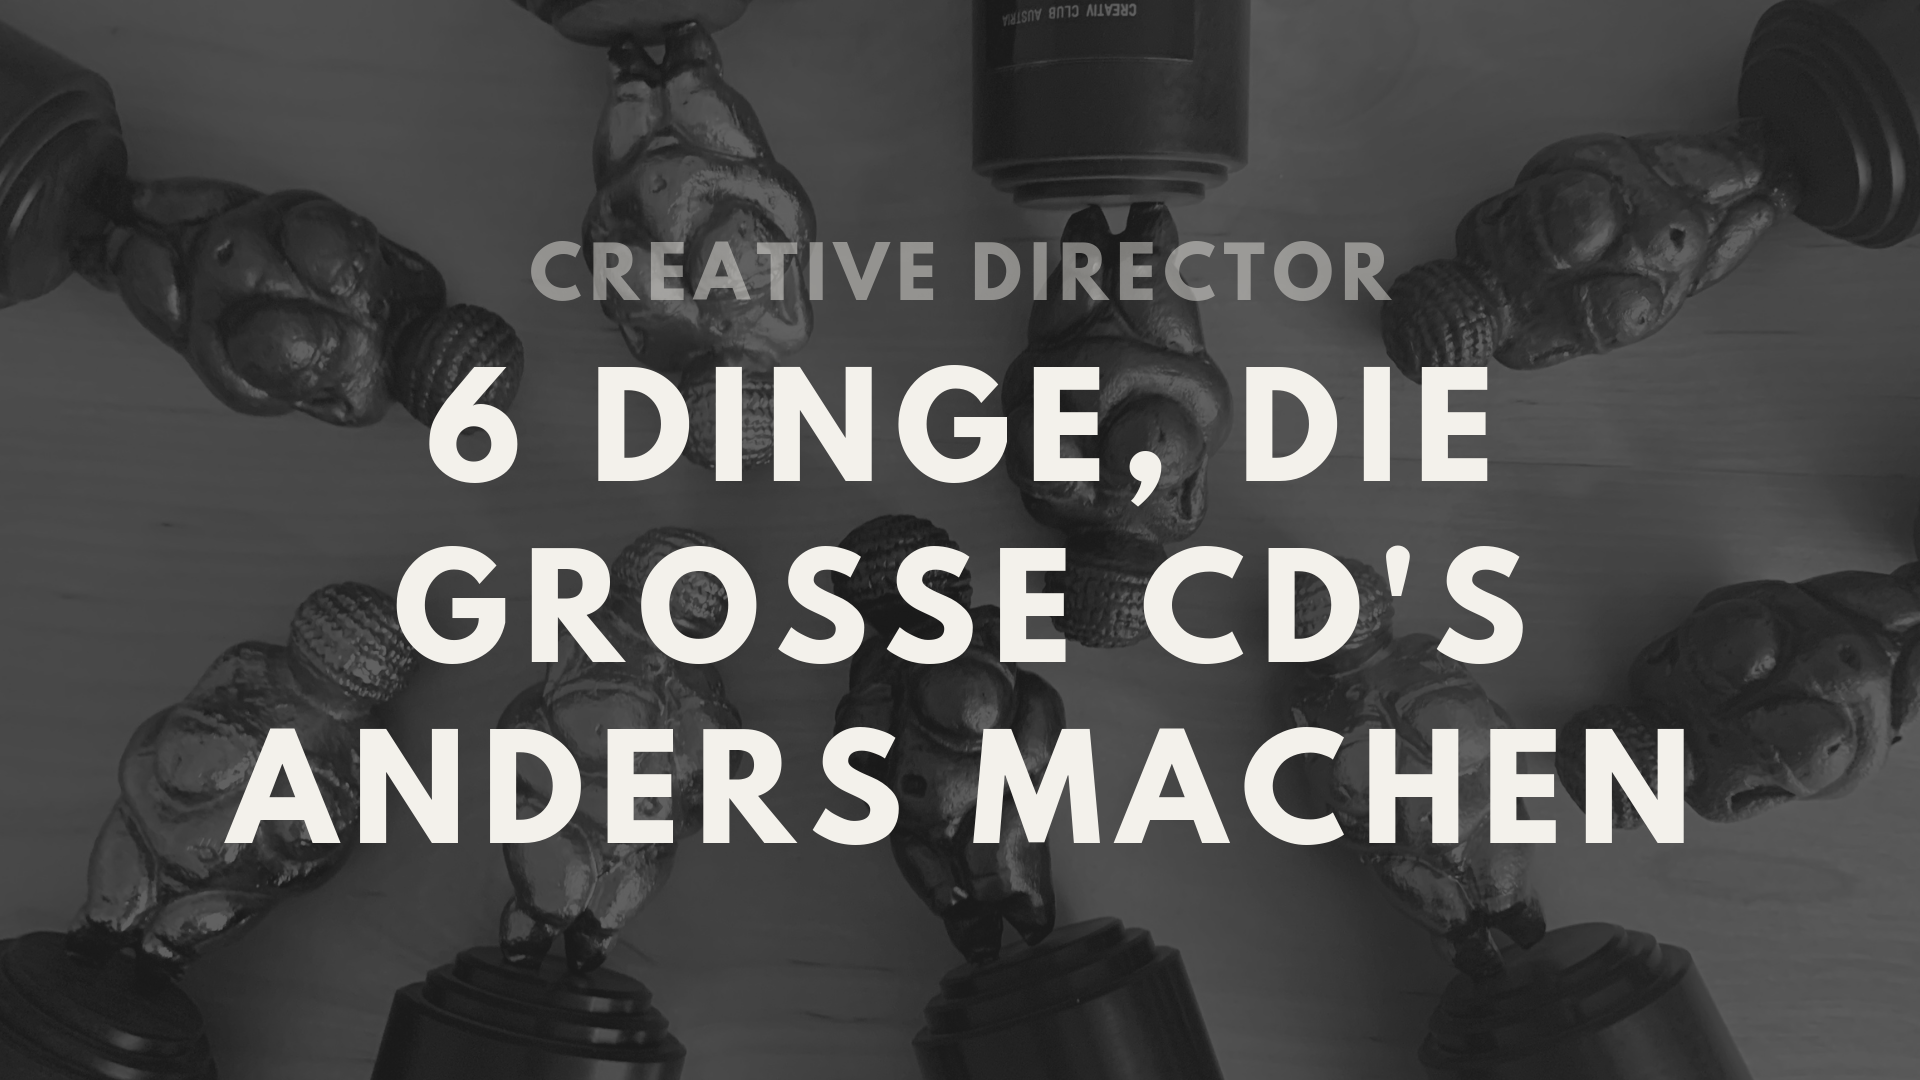 6 dinge creative director